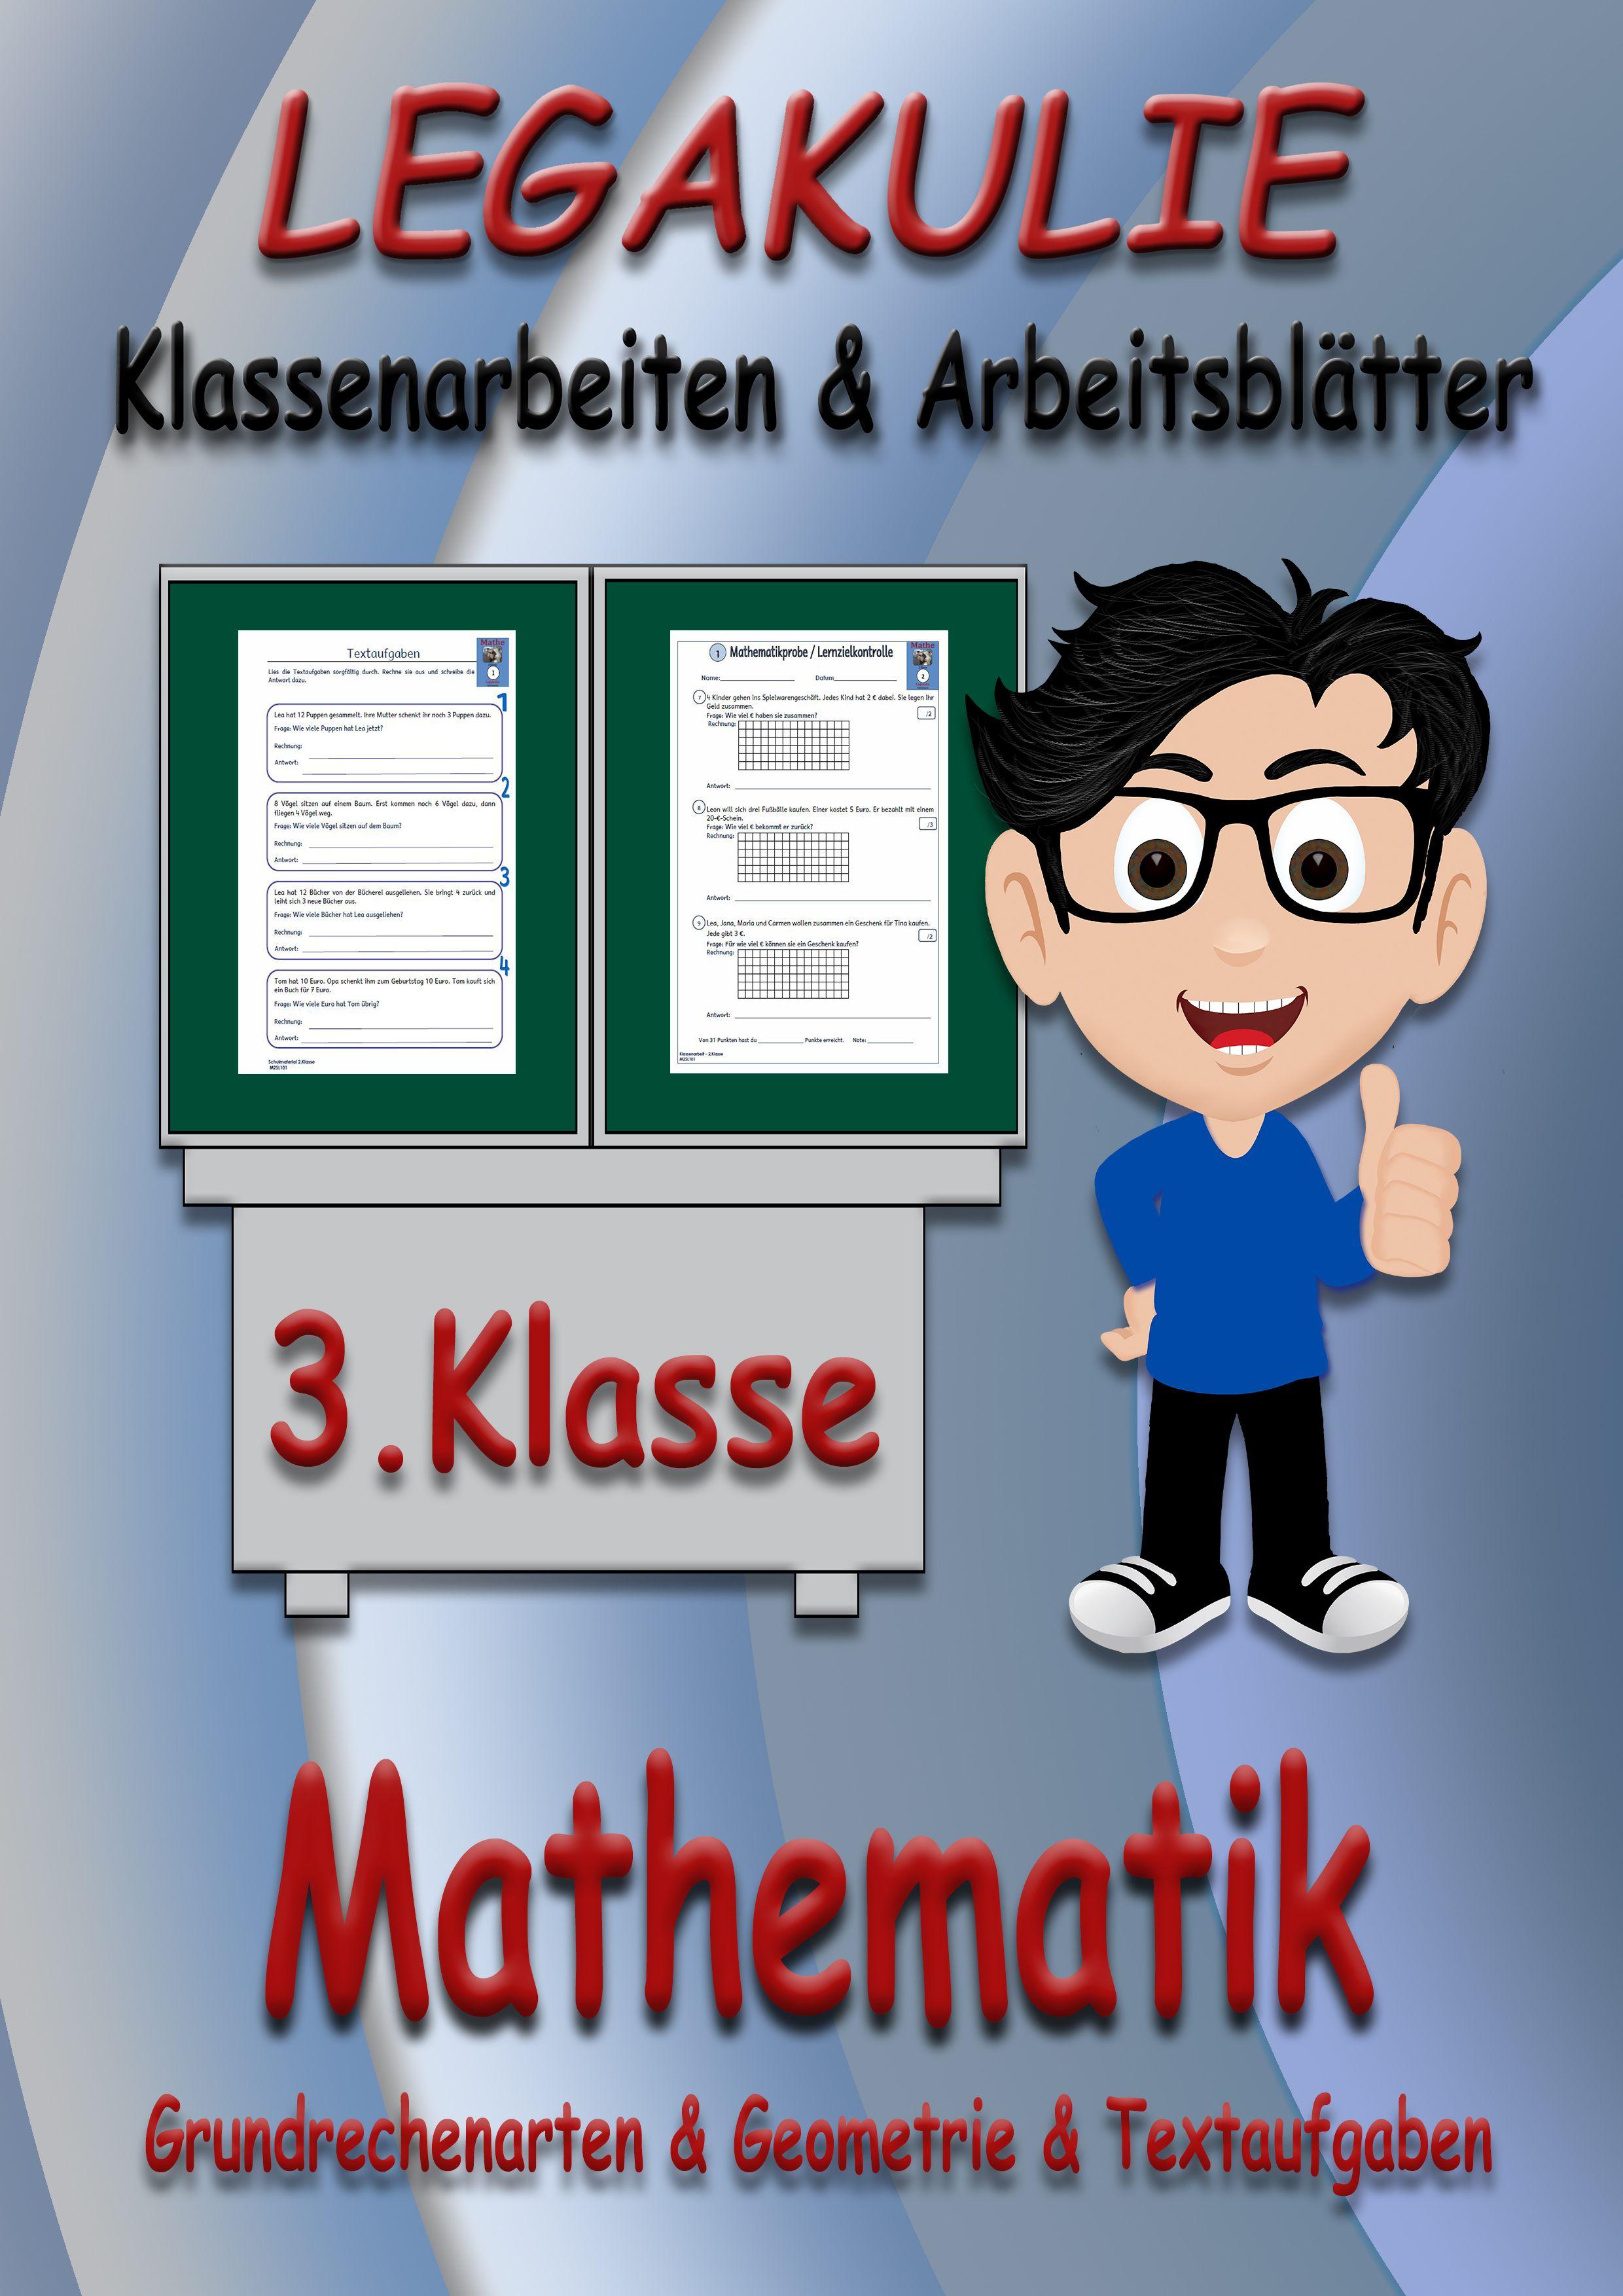 Mathematik #3Klasse #Arbeitsblatt #PDF Arbeitsblätter / Übungen ...